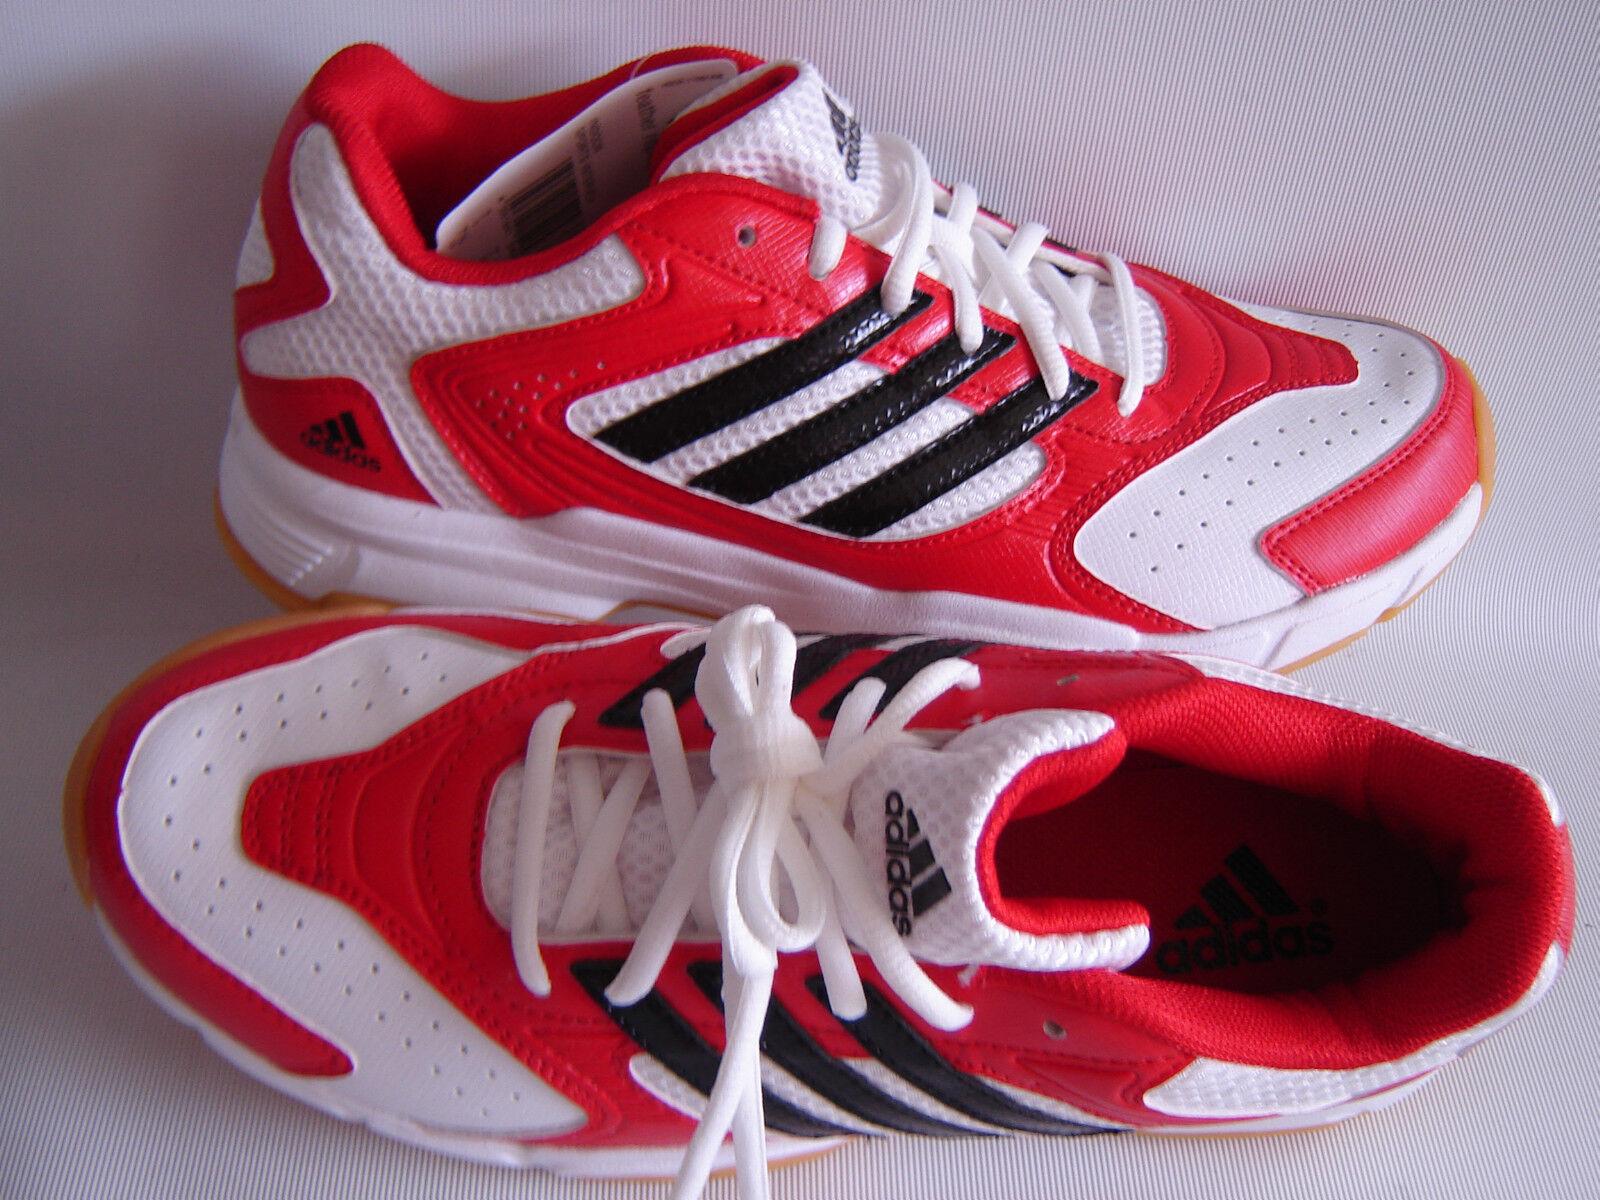 ADIDAS Feather Replique Indoor Trainer Court schuhe UK UK UK Größe 7 EU 40.2 3  NEW BOXED b25993